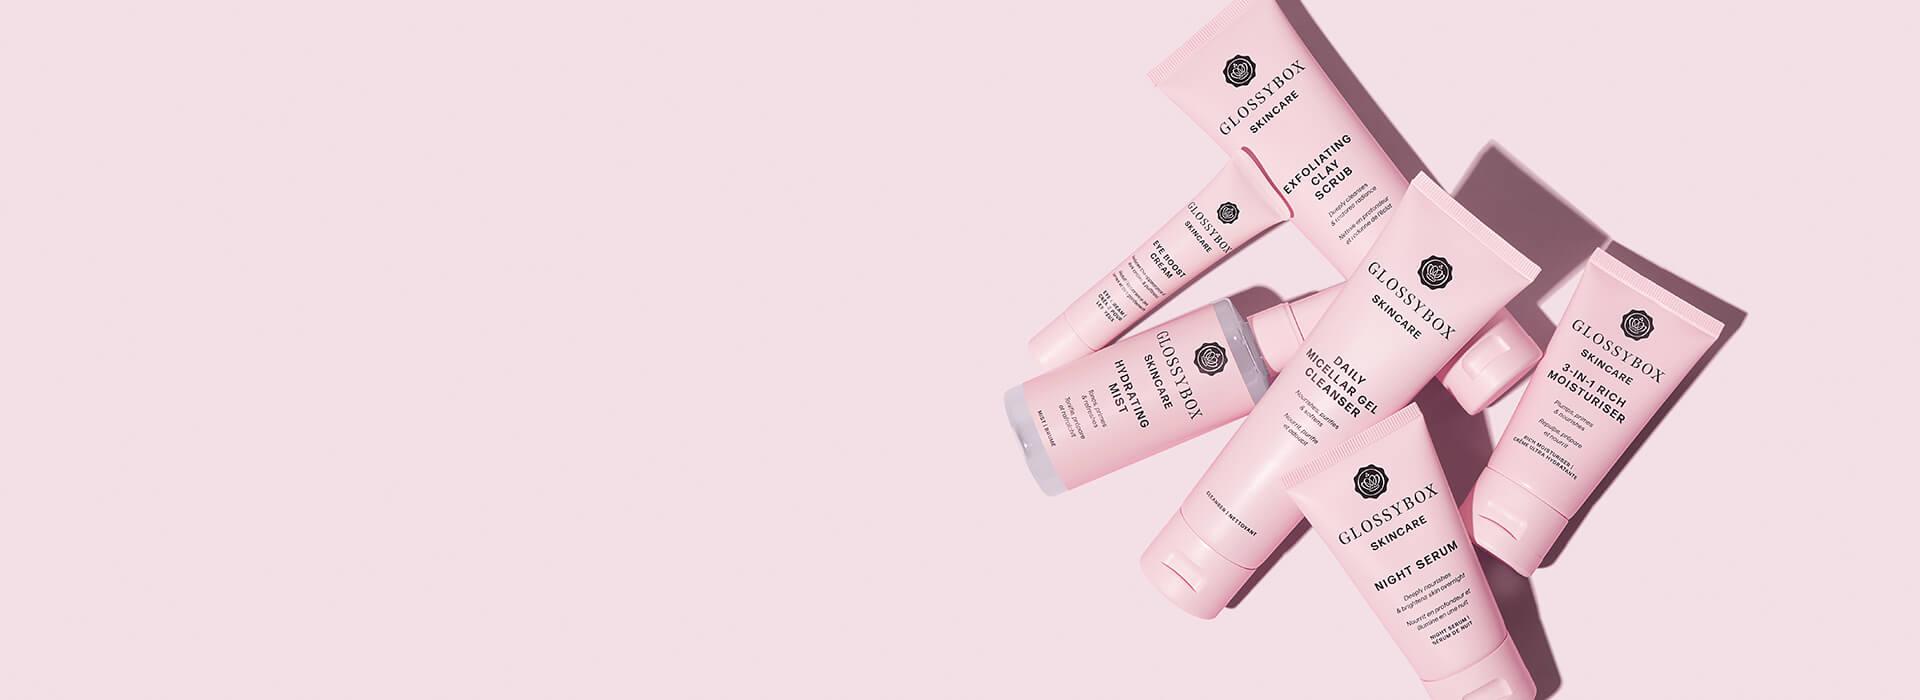 GLOSSYBOX Skincare Sets